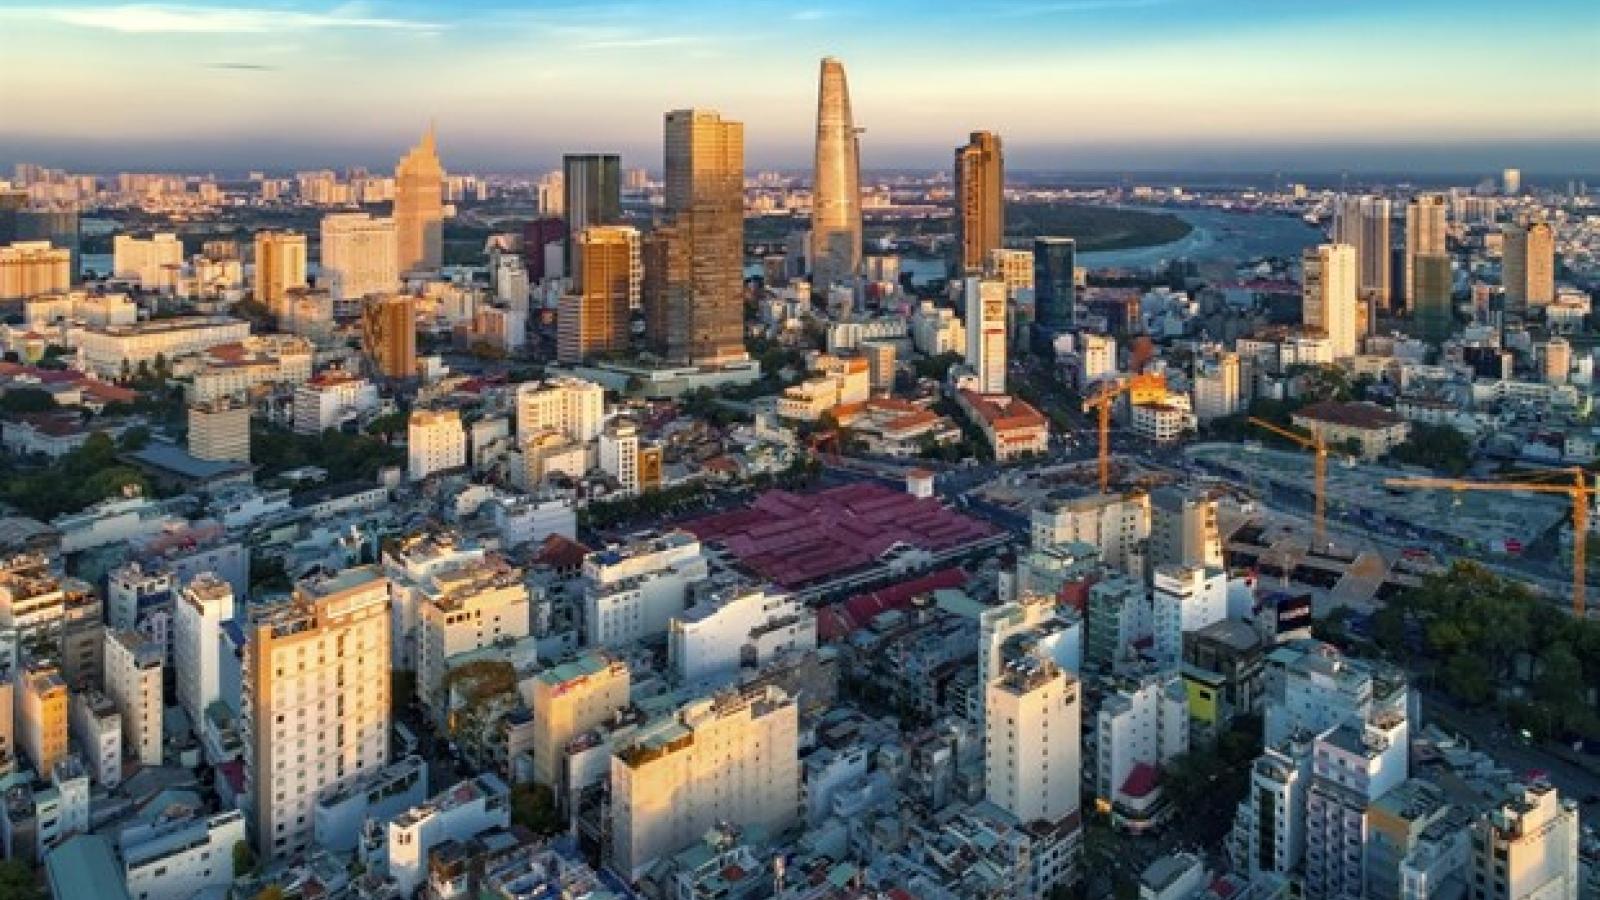 HCM City receives US$1.45 billion of remittances in Q1